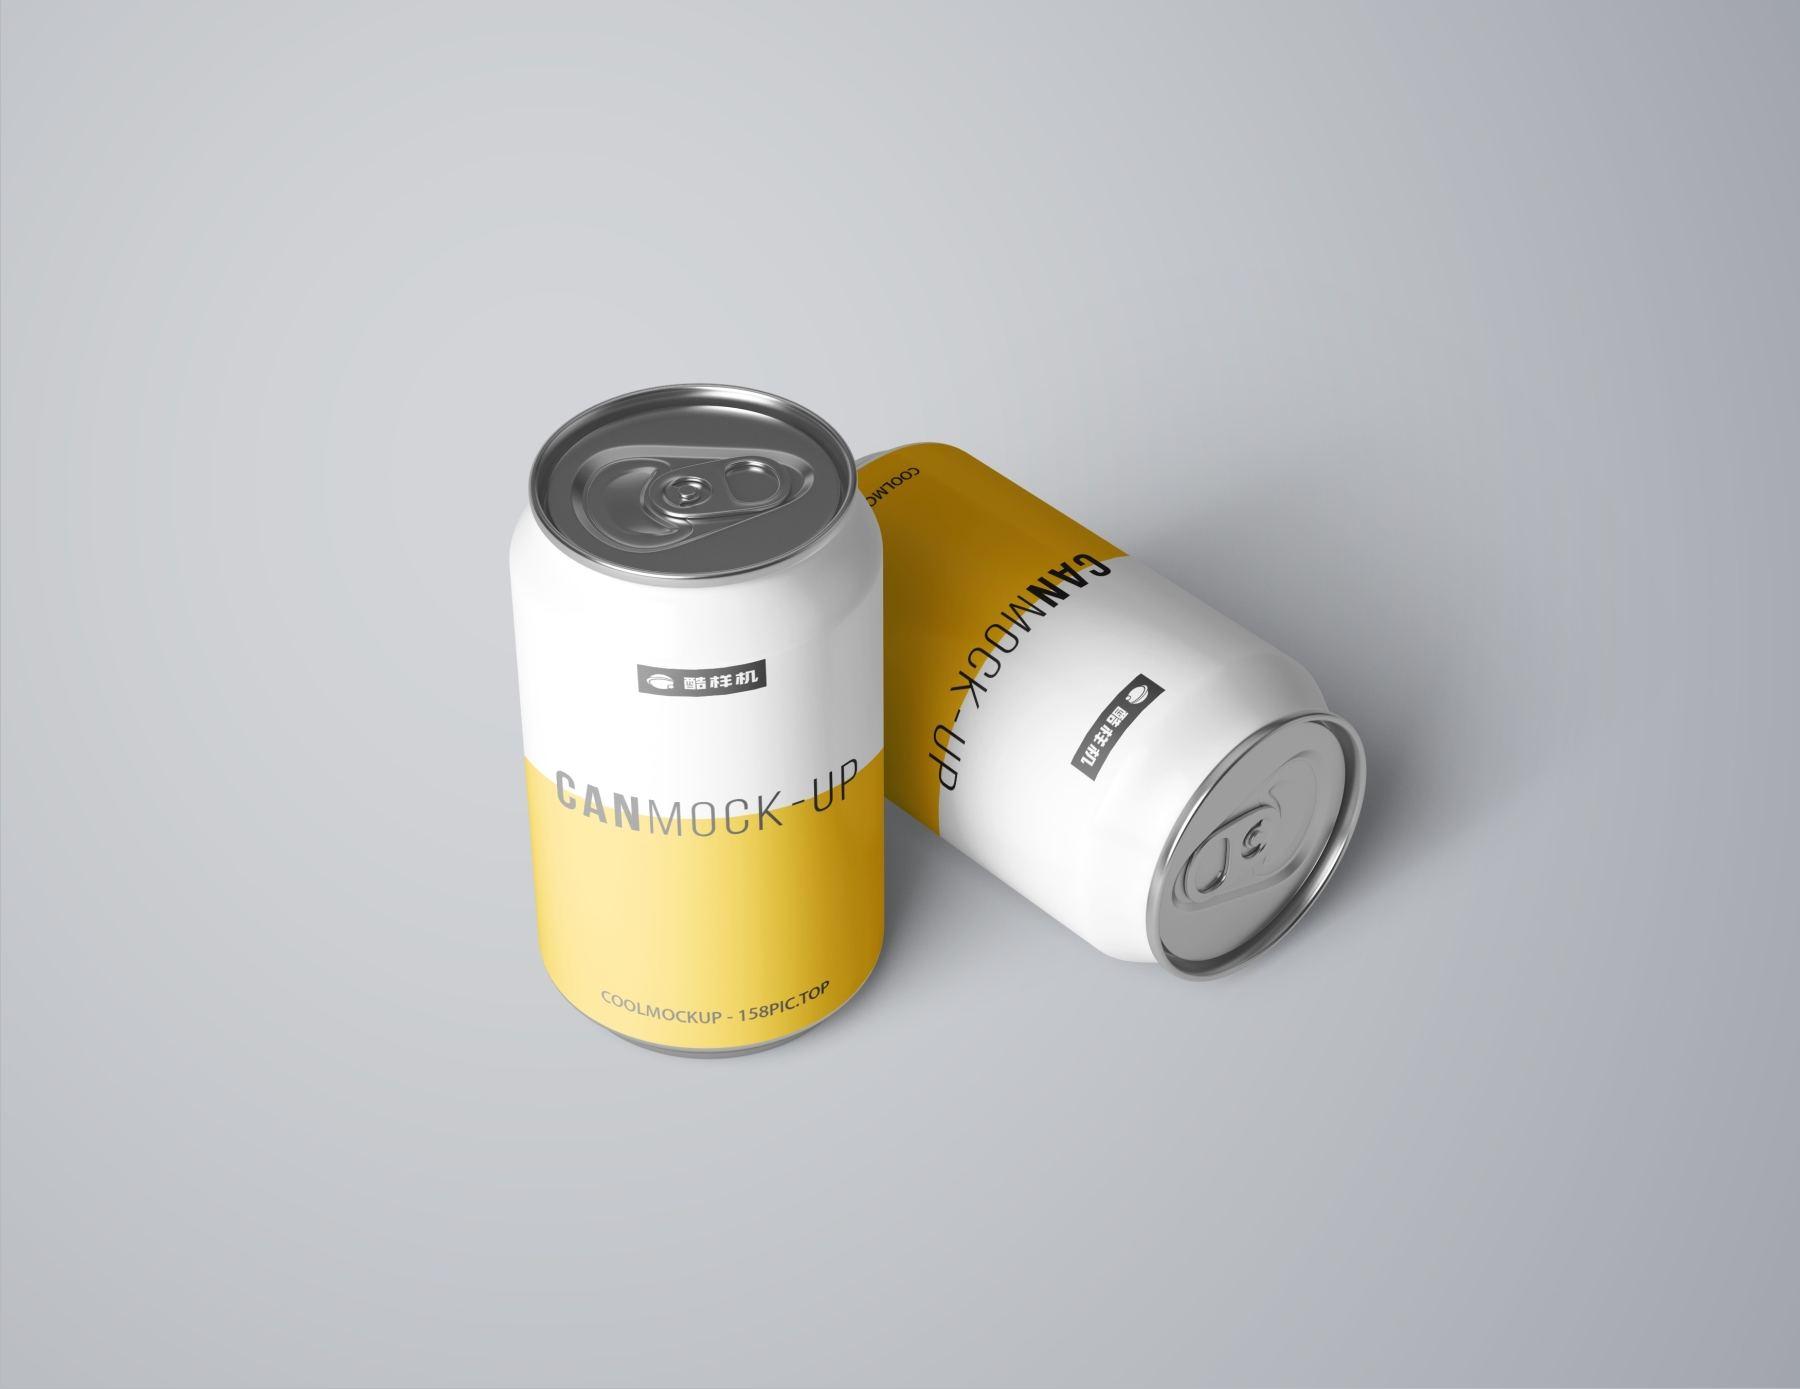 726f87c97c64cf0 - 简约饮料啤酒包装易拉罐样机